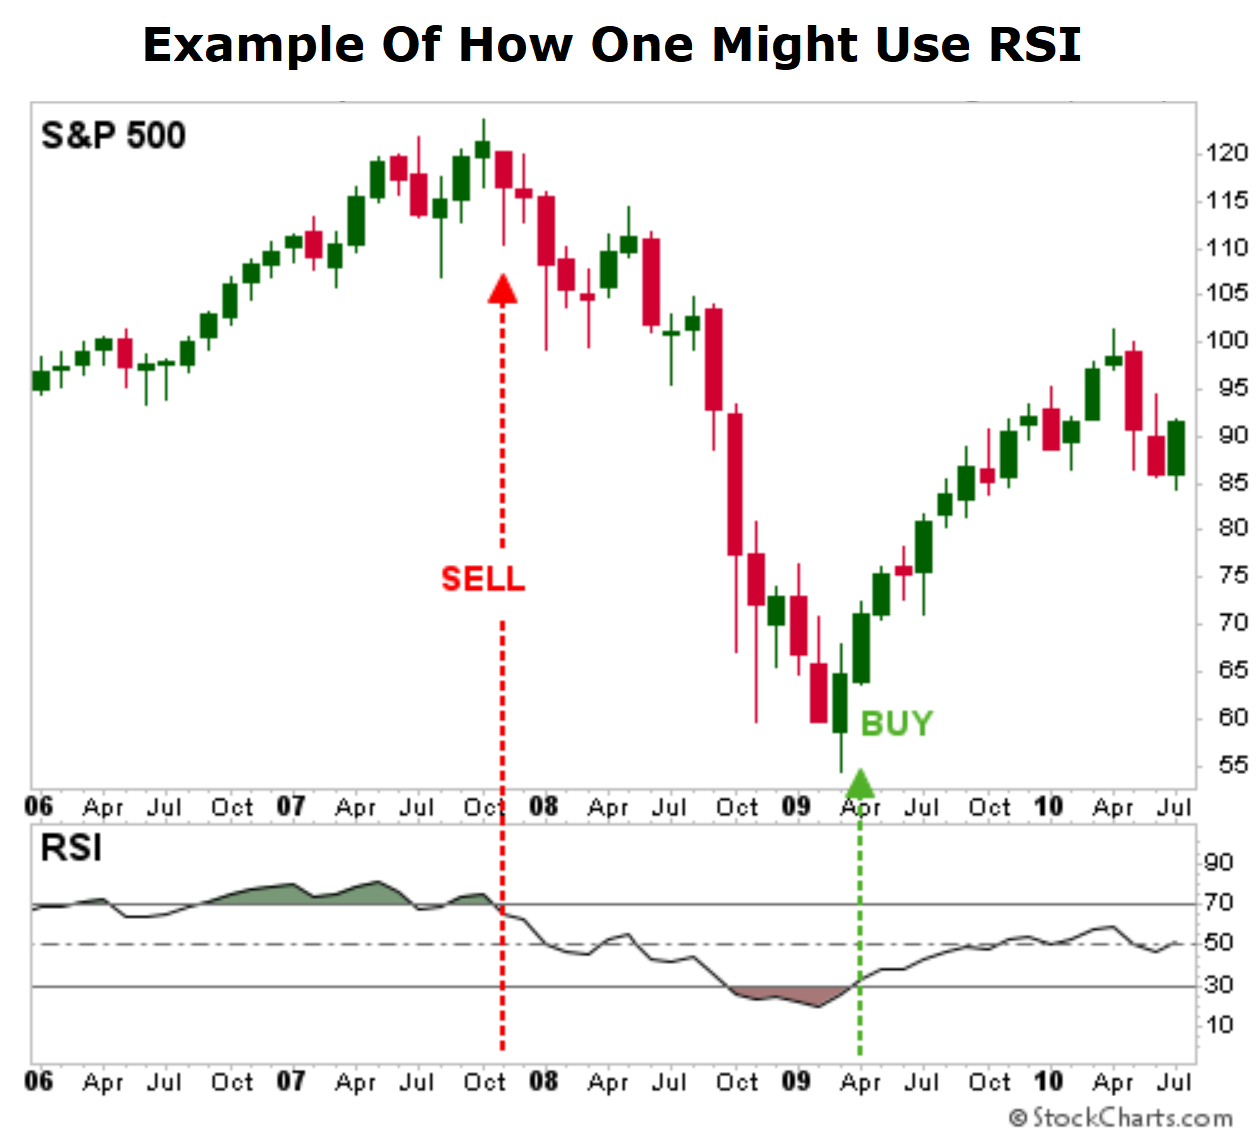 RSI chart of S&P 500